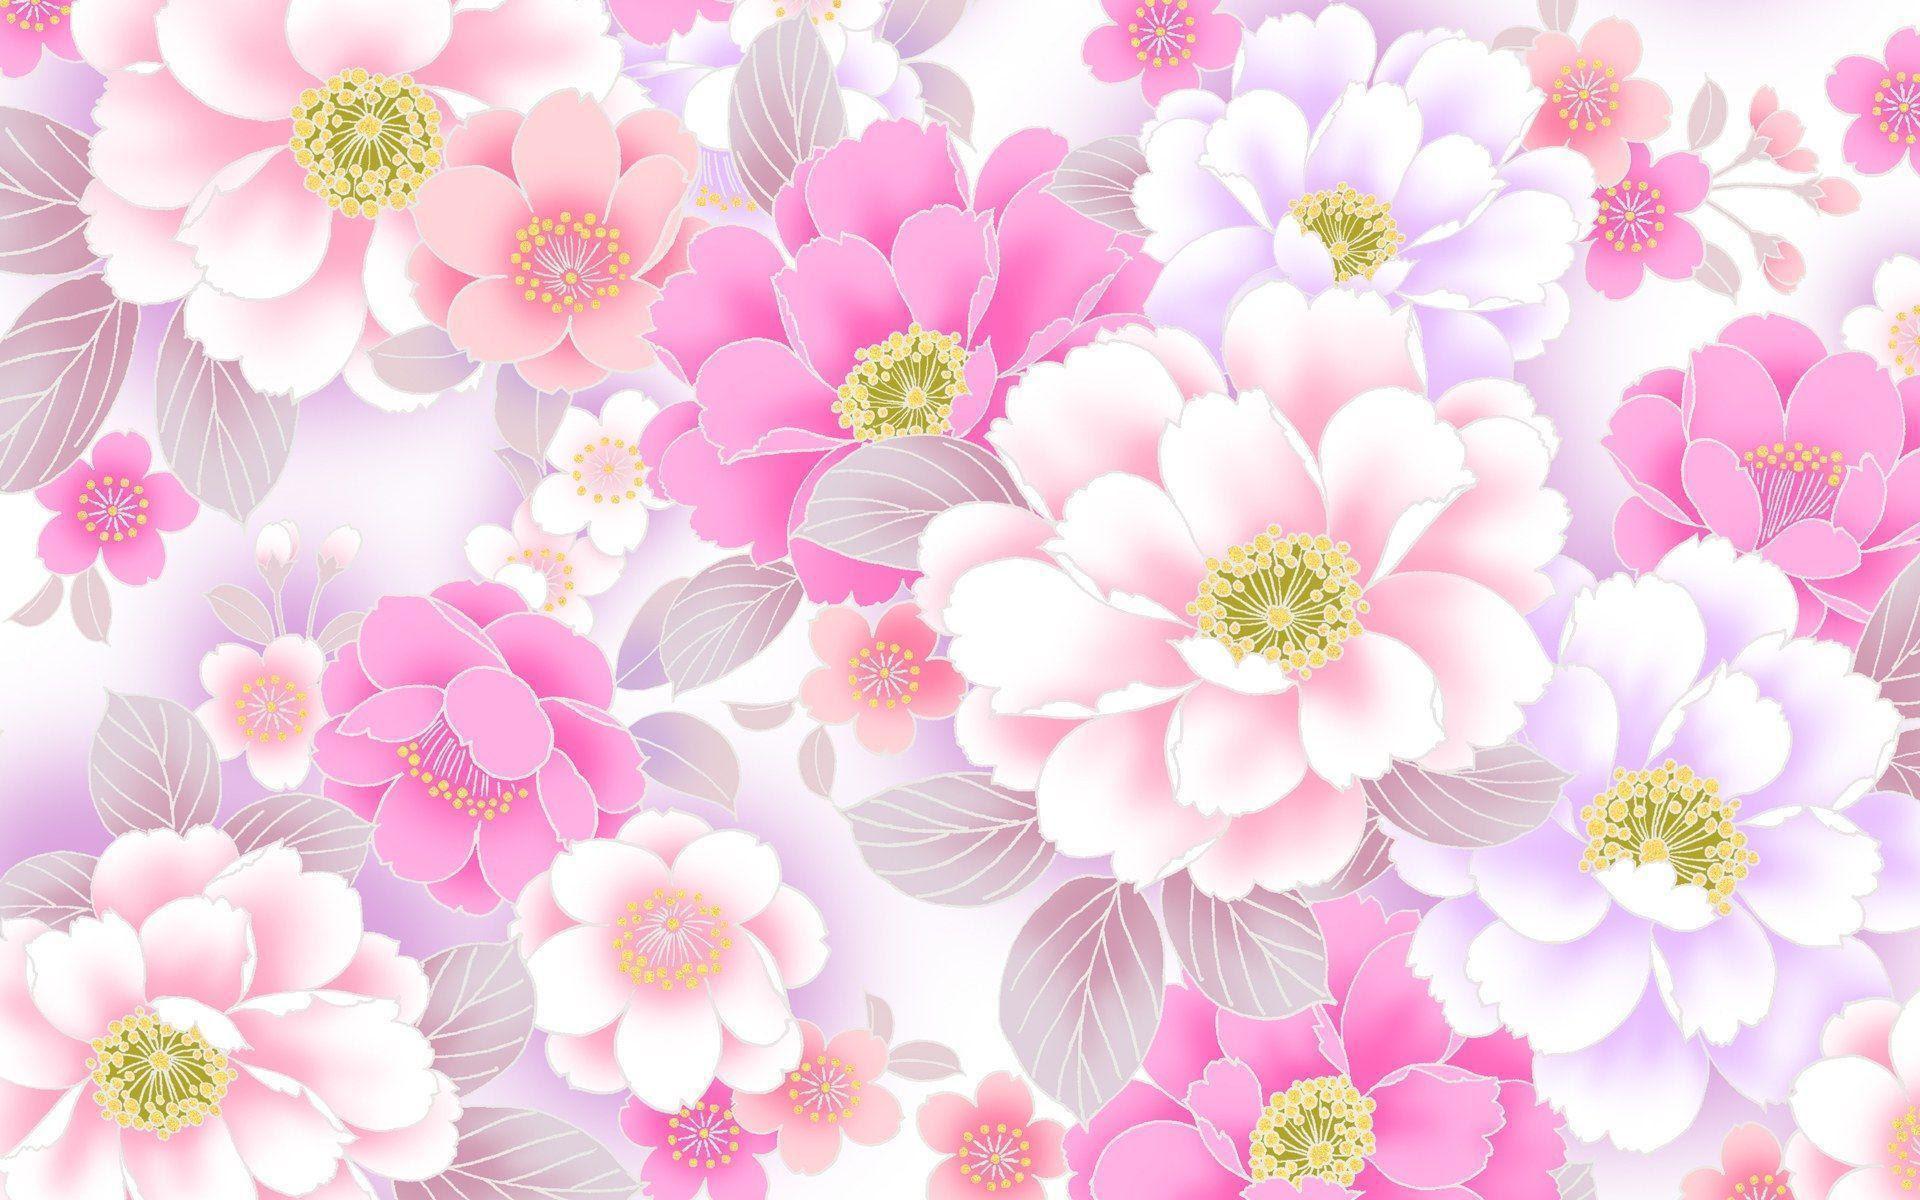 Pink Flower Wallpapers - Wallpaper Cave